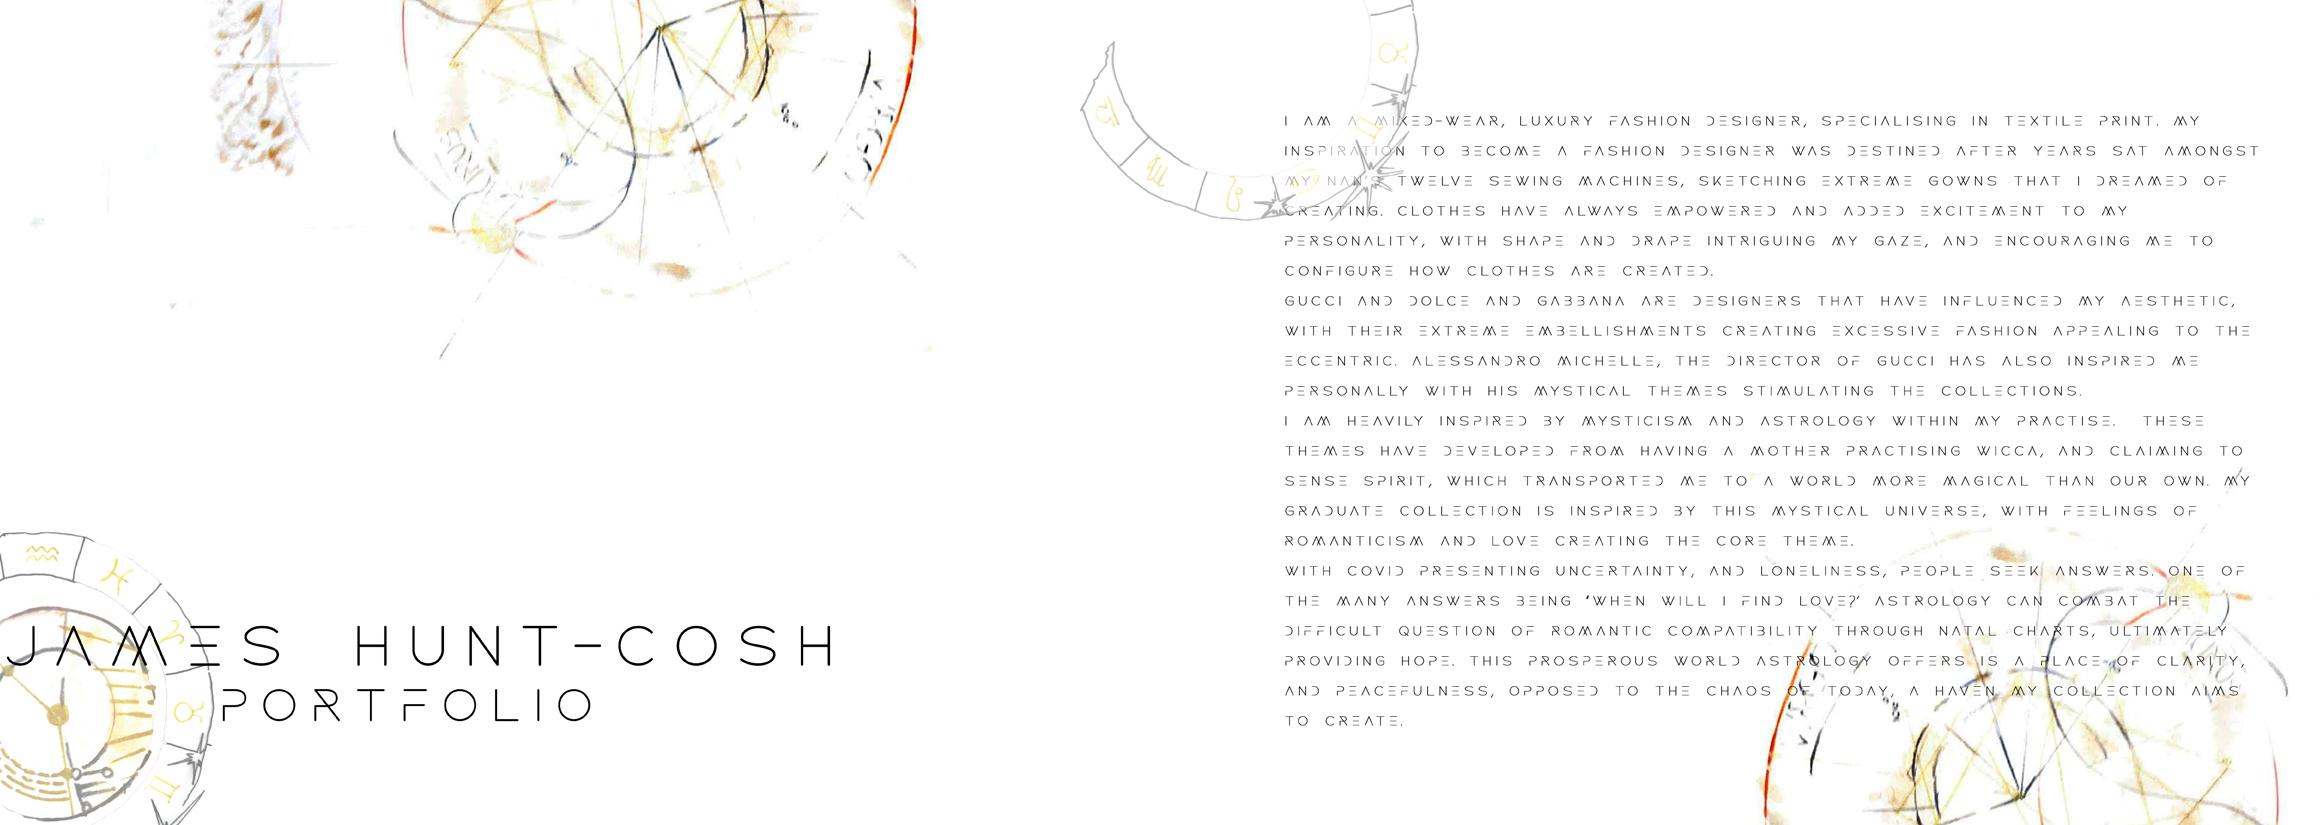 James Hunt-Cosh